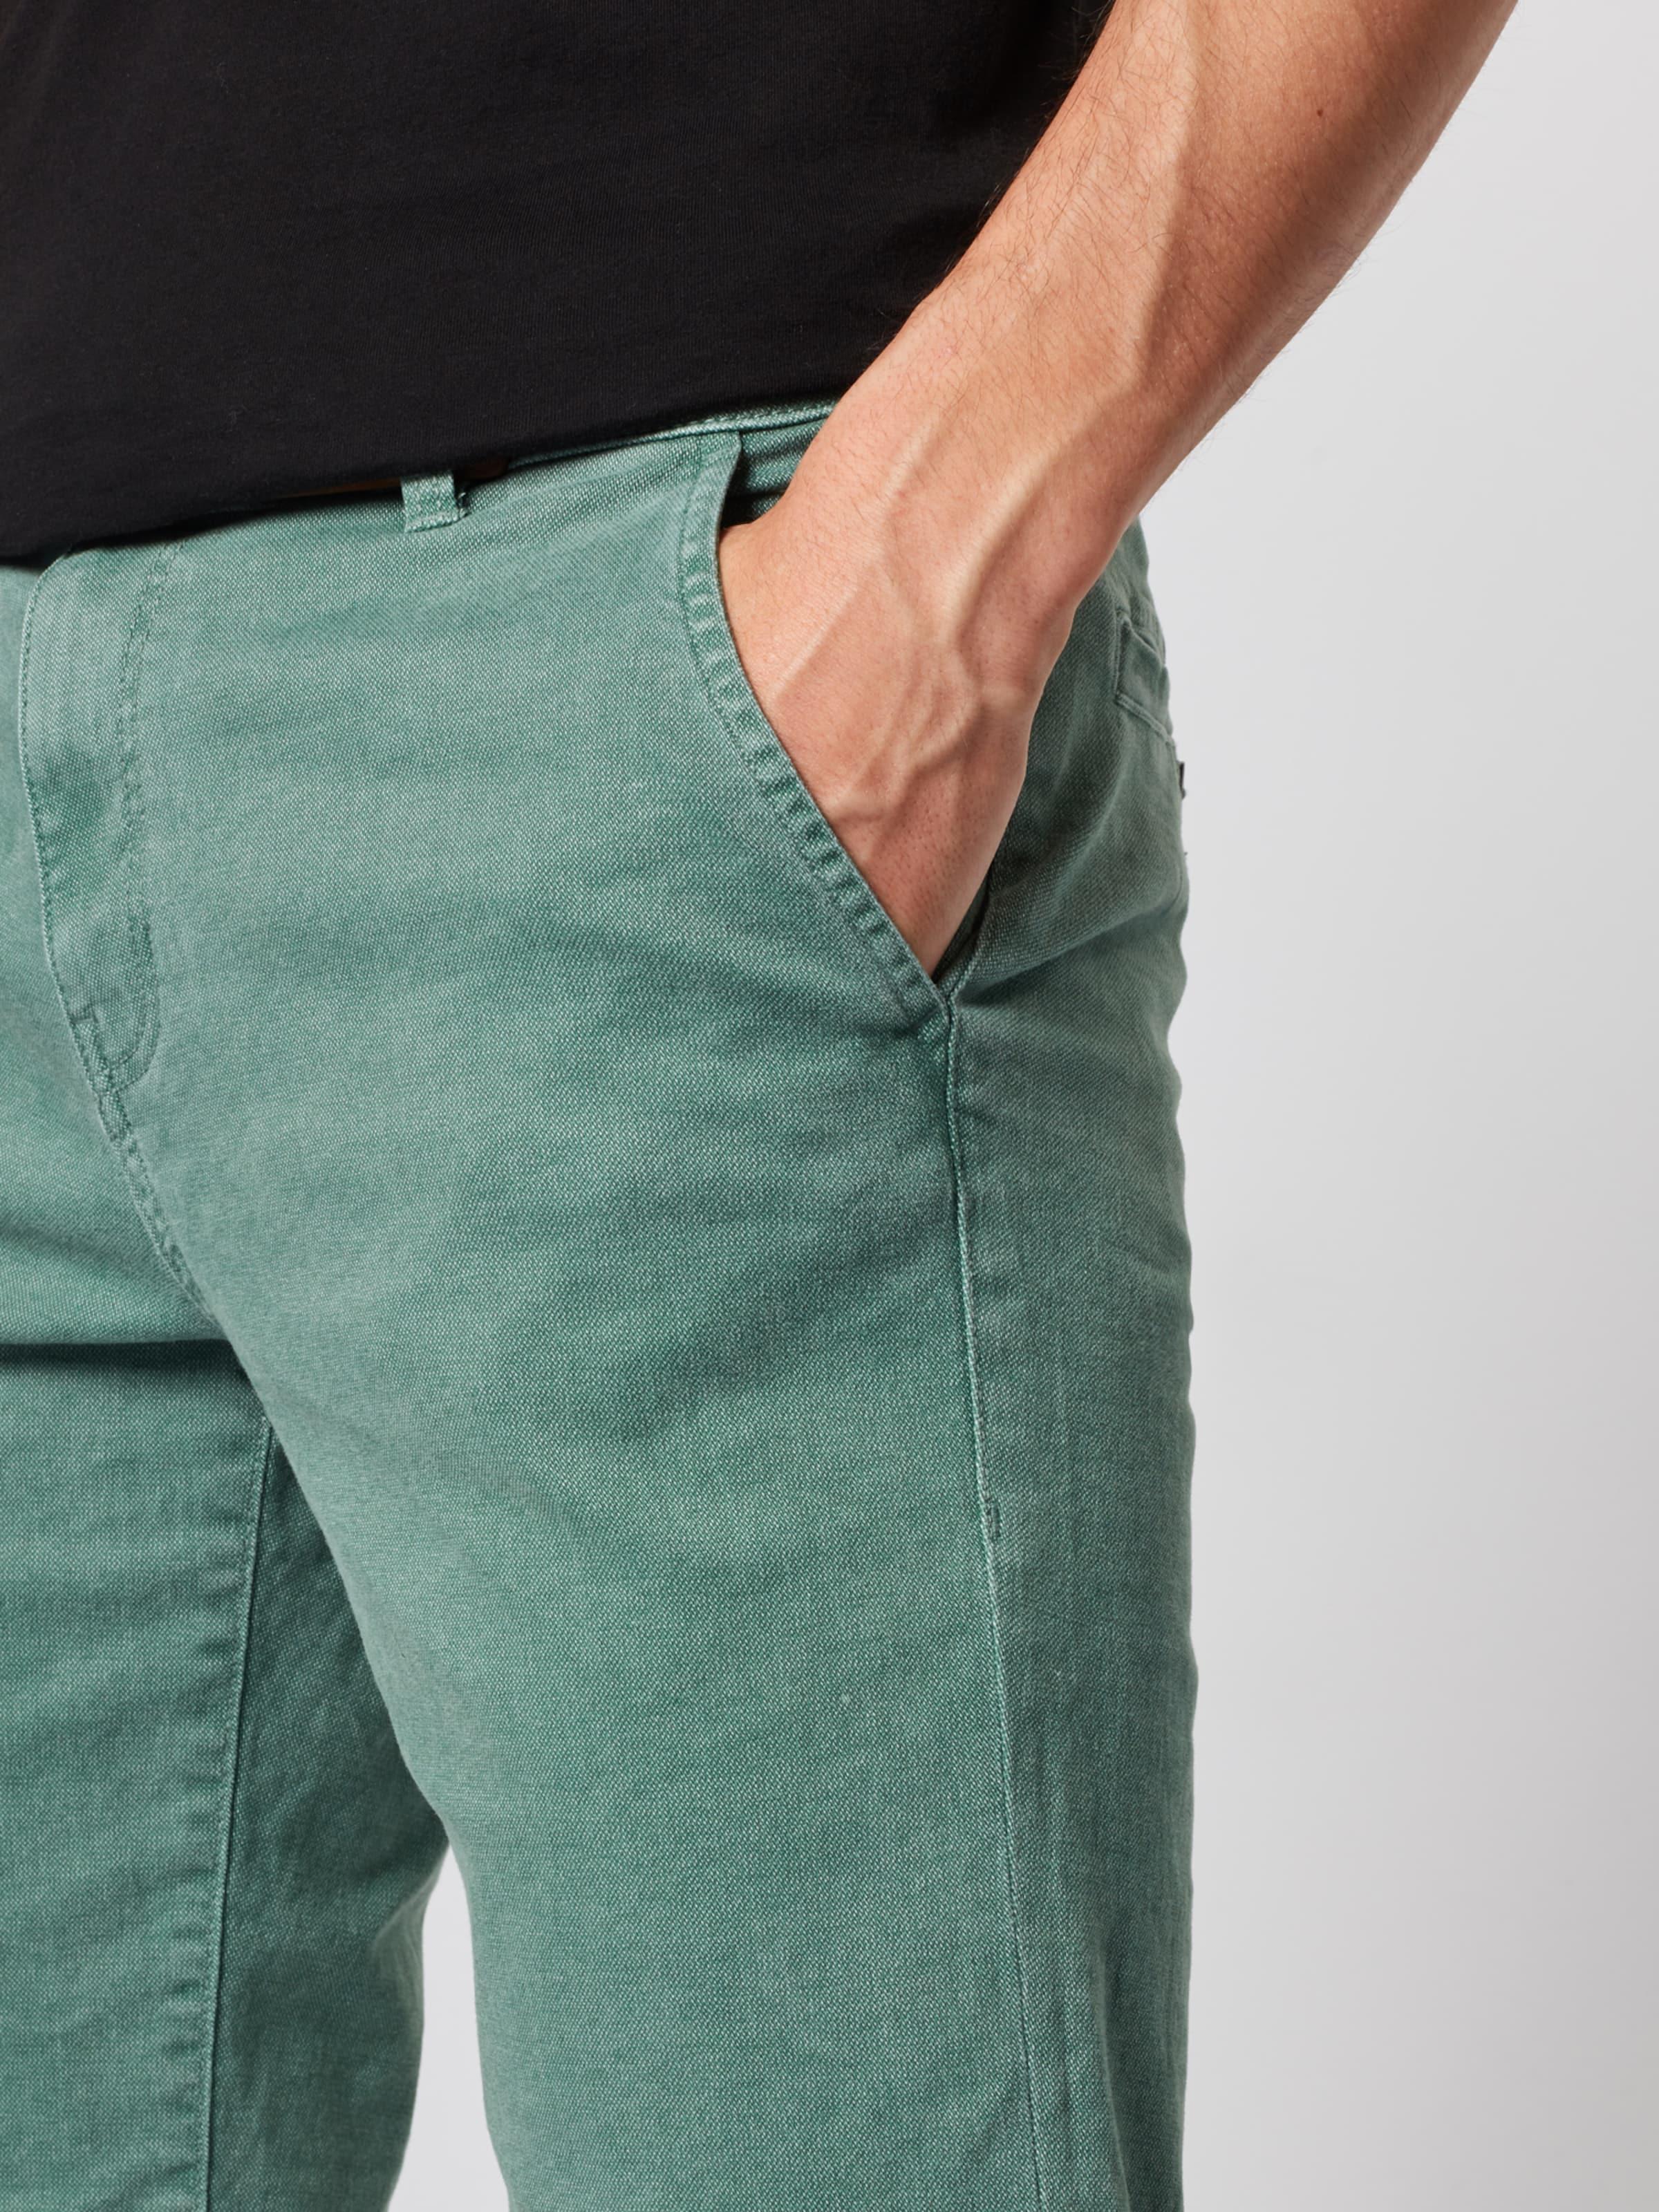 En Denim Tailor Foncé Gris Pantalon Chino Tom clK3T1FJ